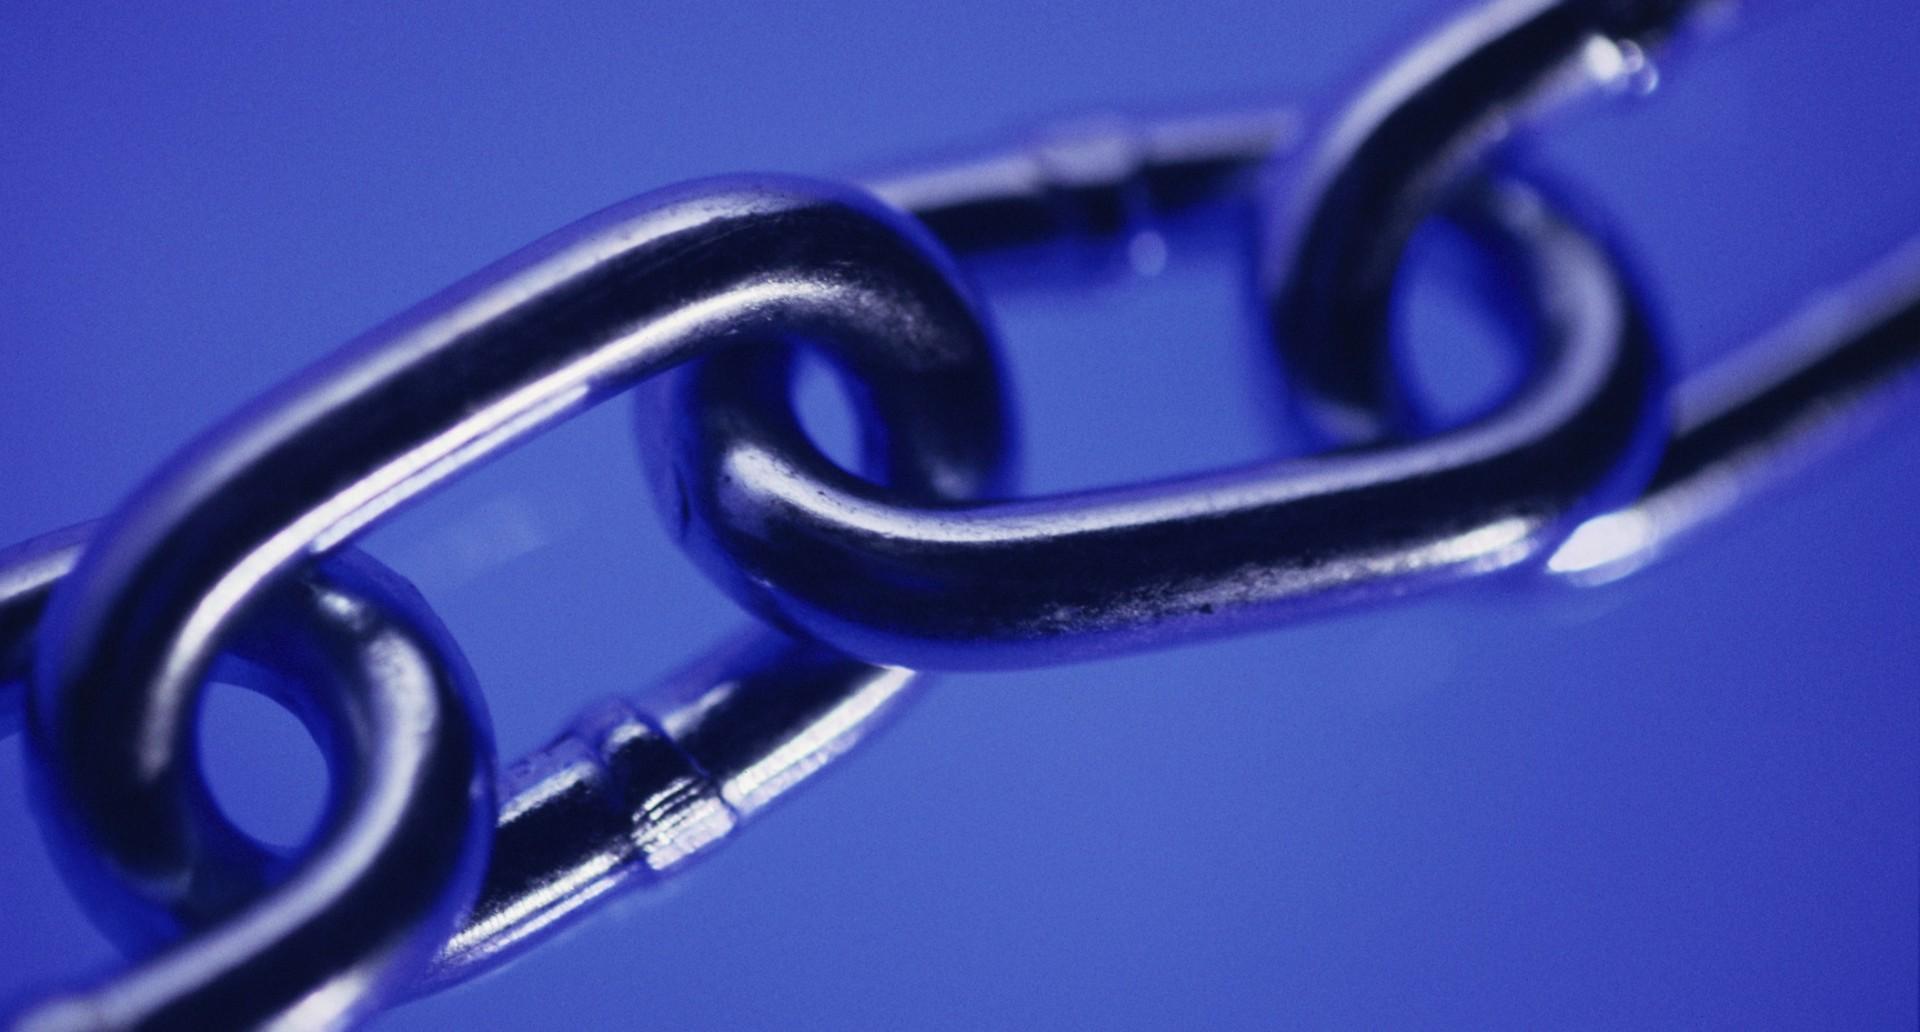 IBM, FDA Partner to Explore Secure Health Data Exchange Through Blockchain Tech